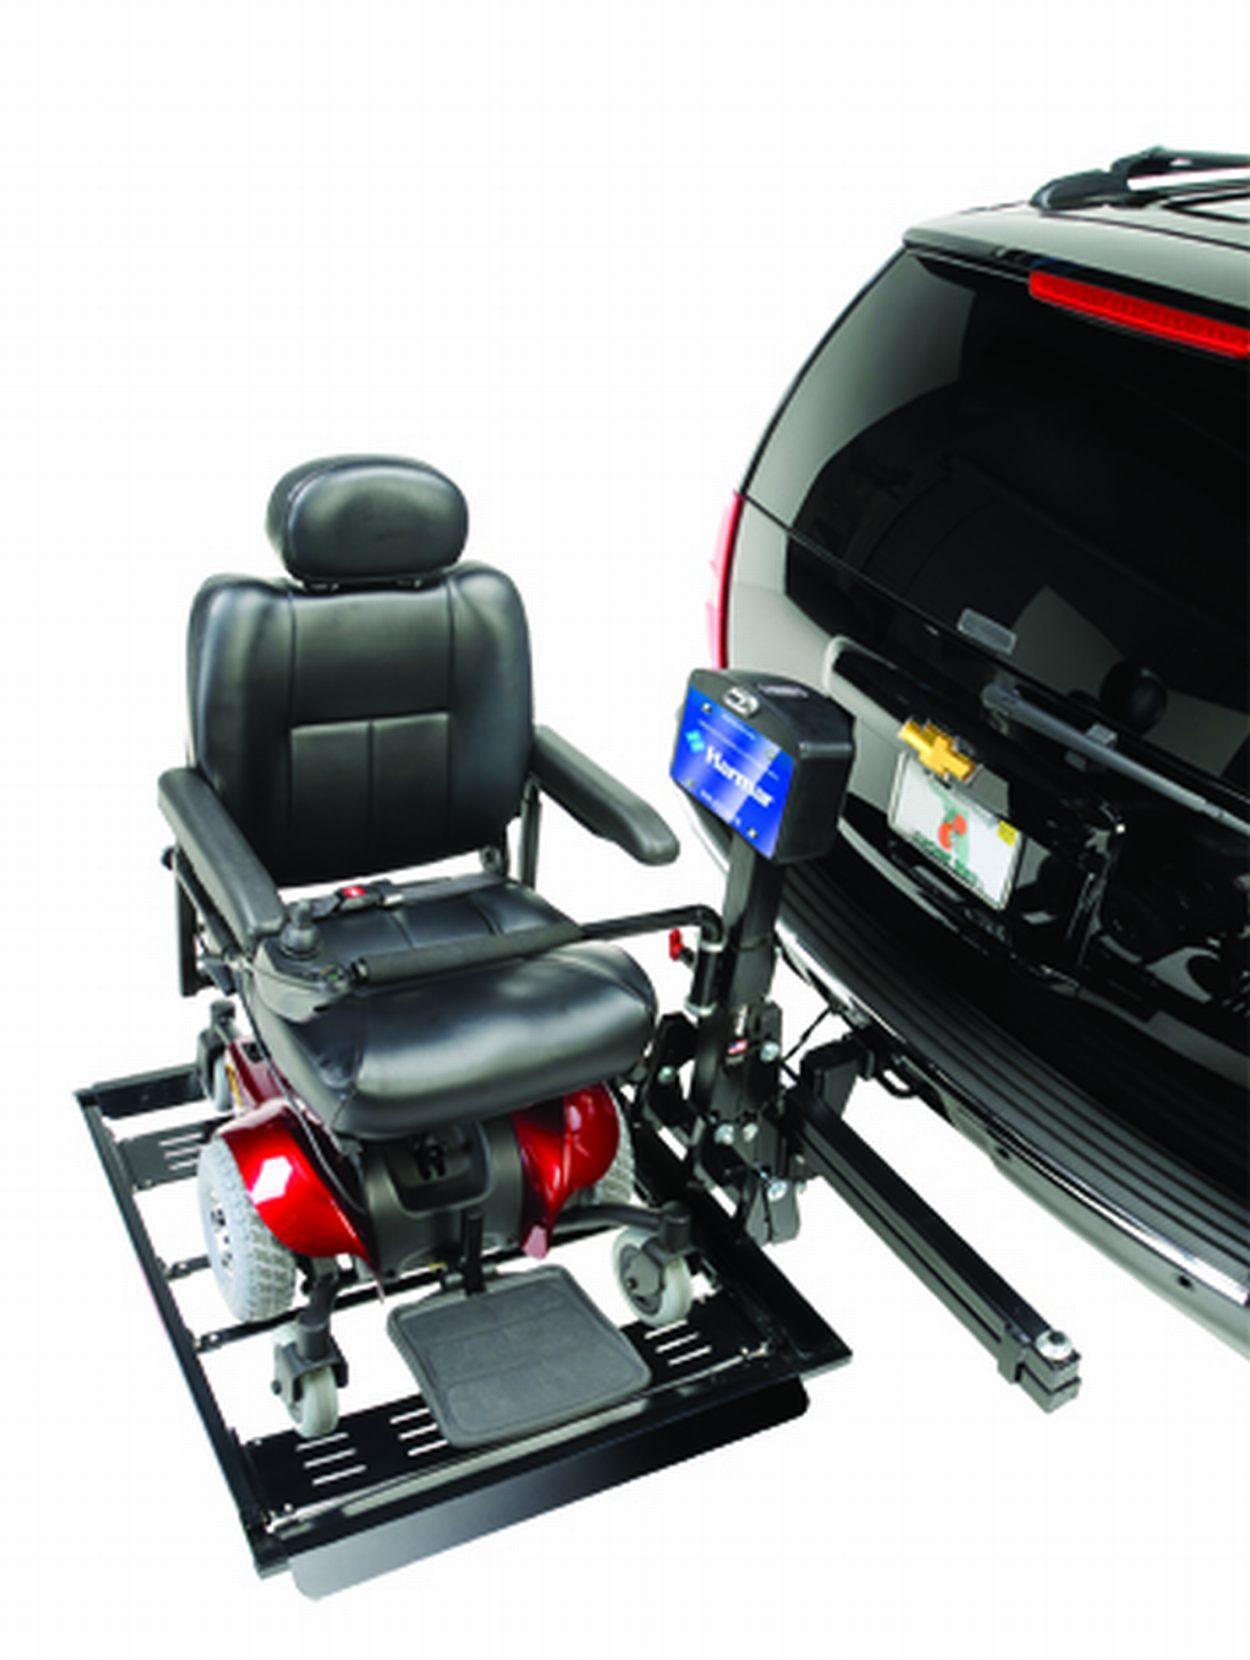 Harmar Mobility AL560 Automatic Universal Power Chair Lift